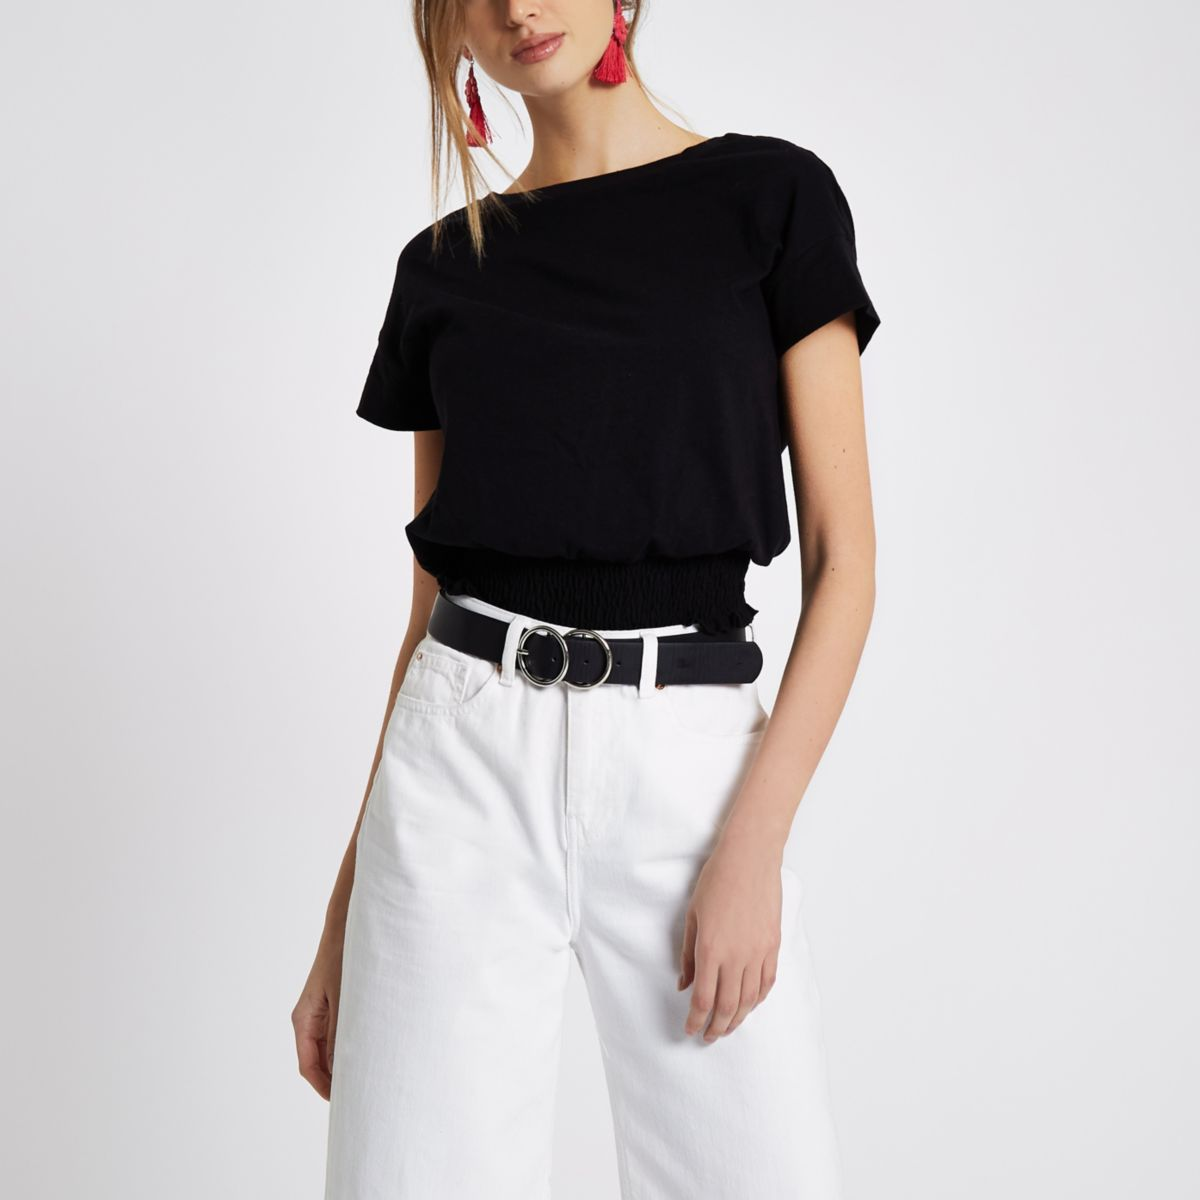 Schwarzes T-Shirt mit gerafftem Saum